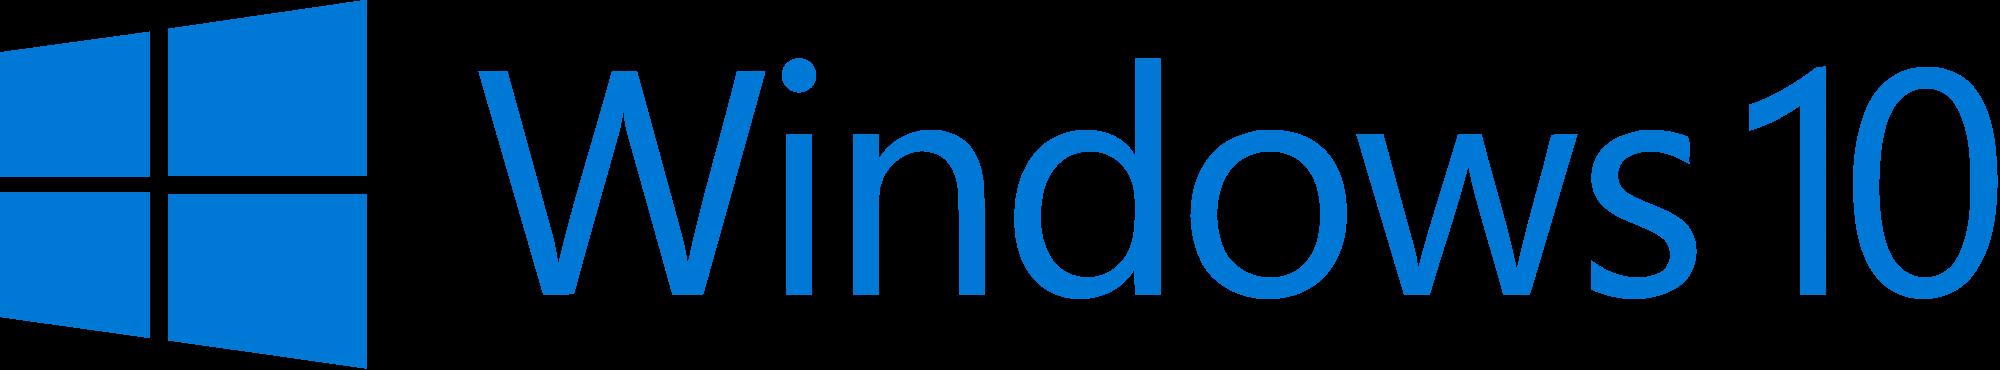 windows-10-logo-1